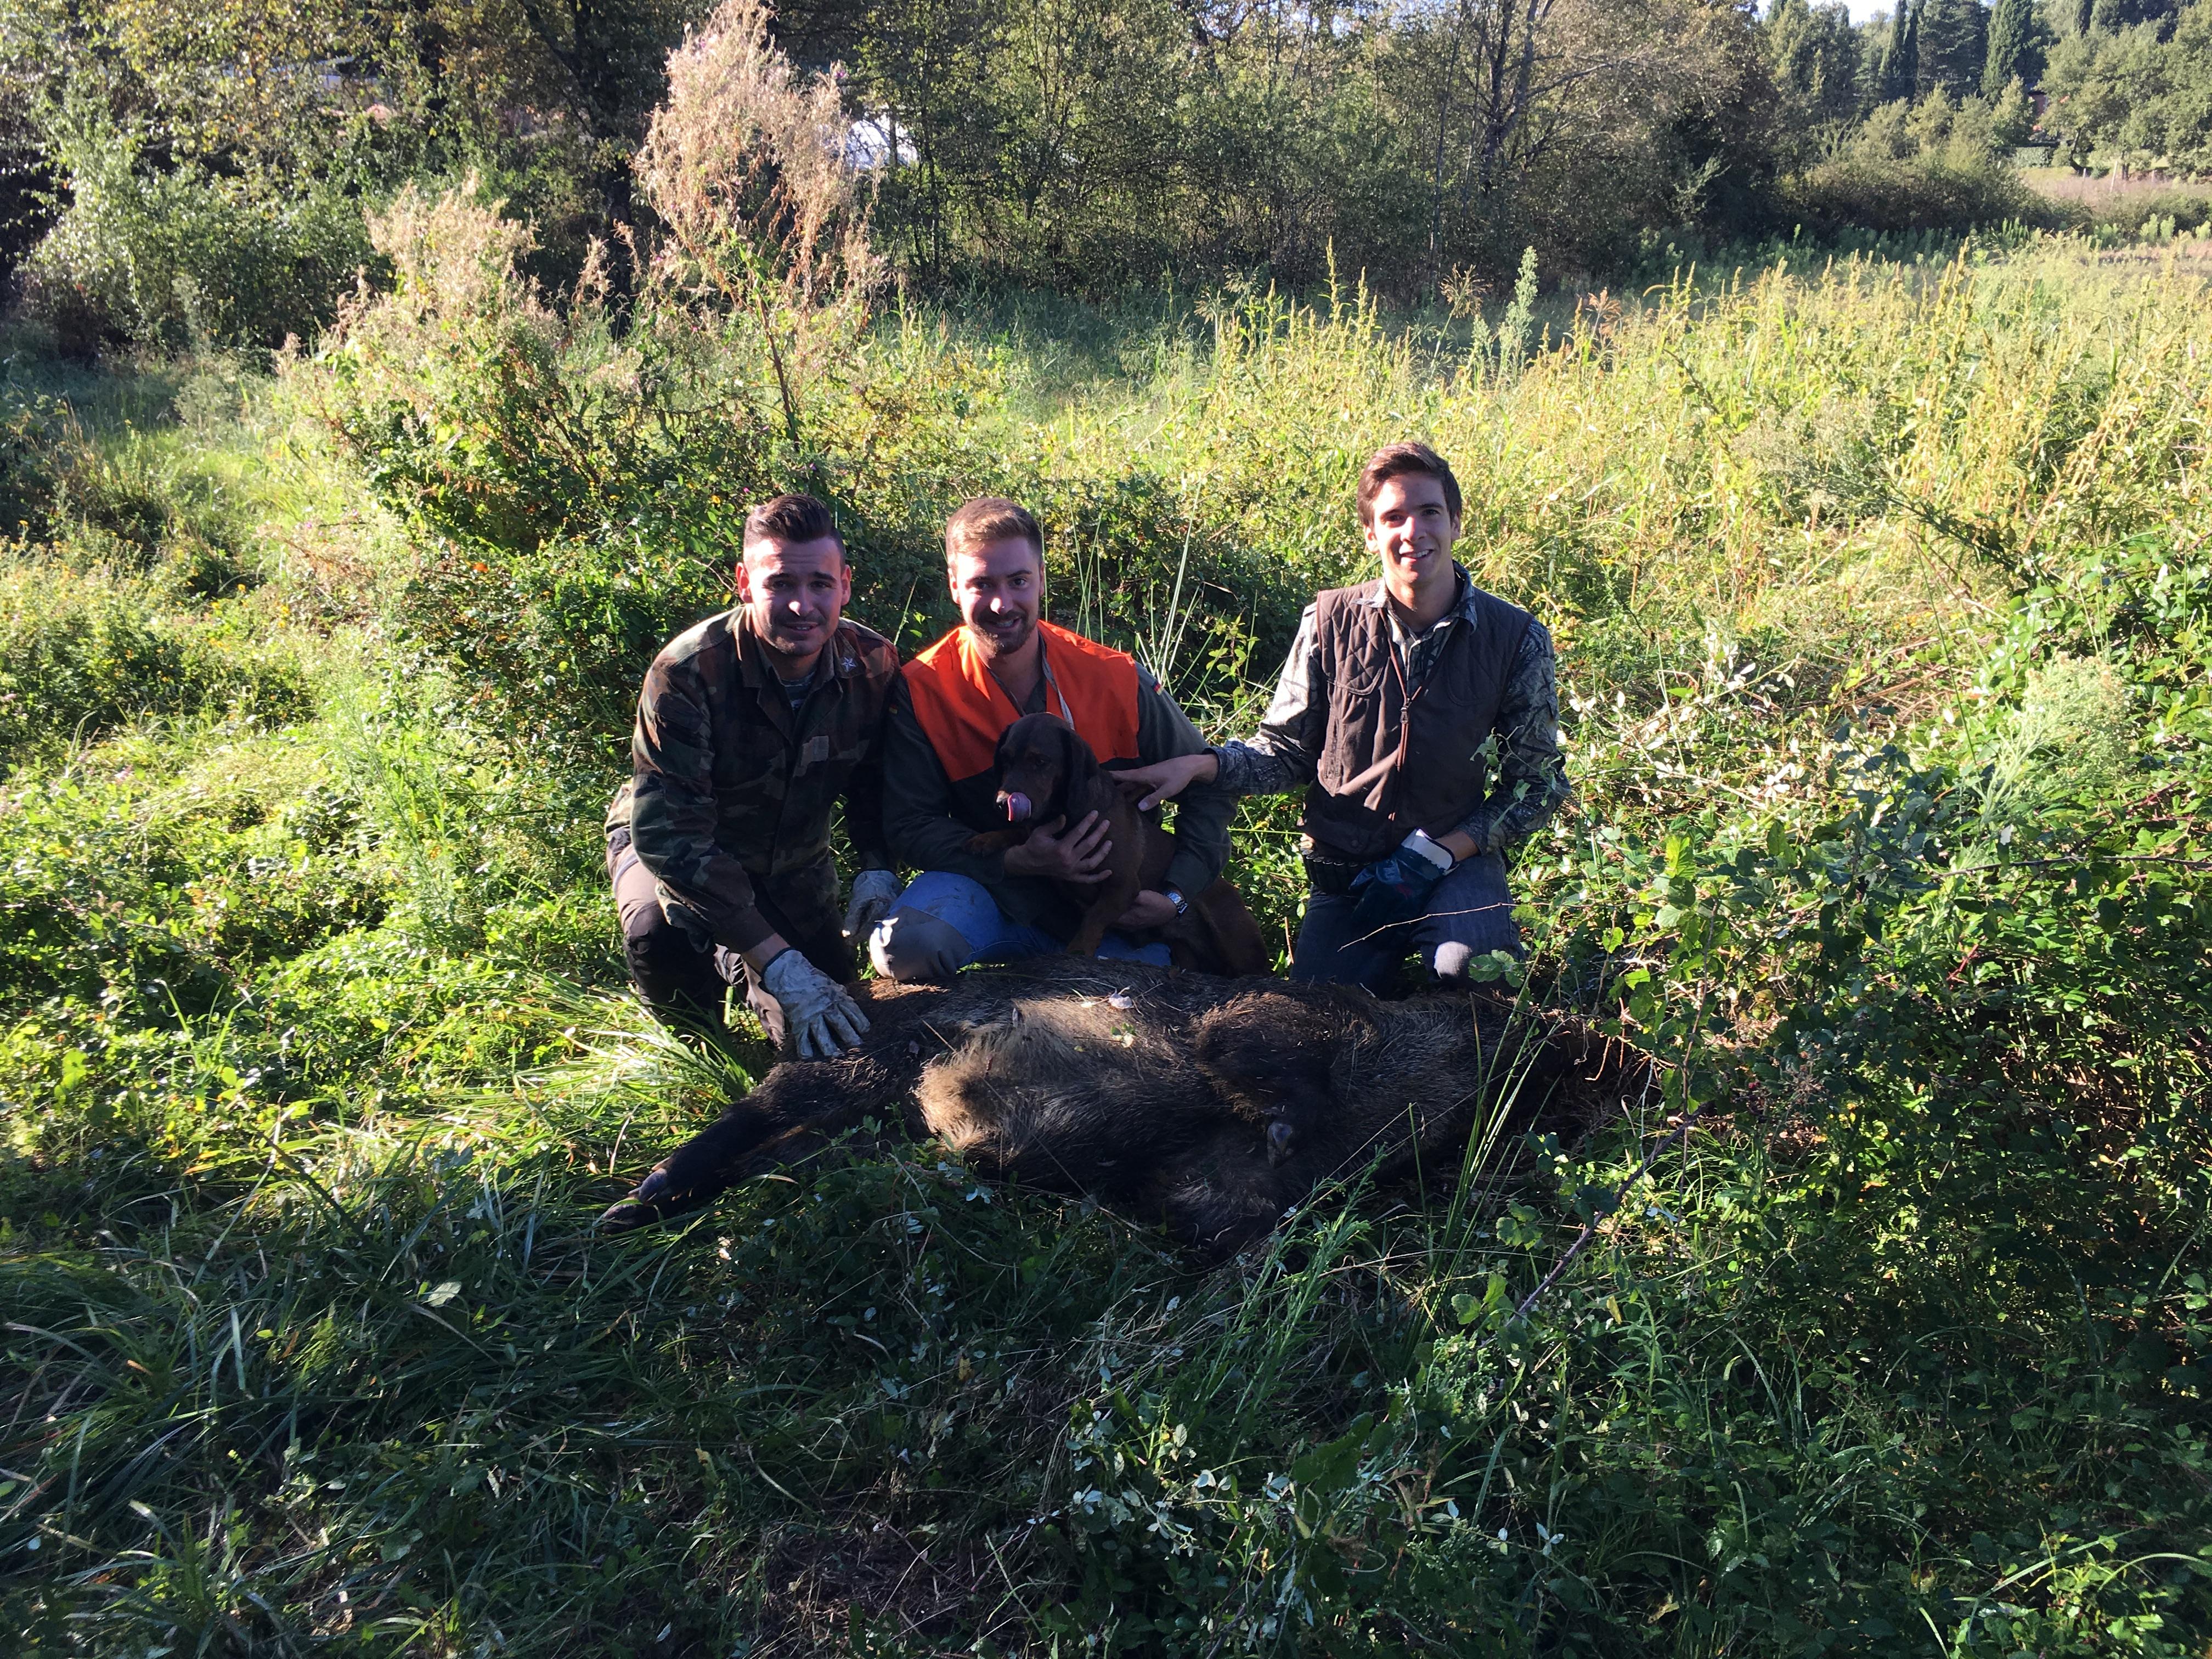 Una sessione di caccia al cinghiale in toscana